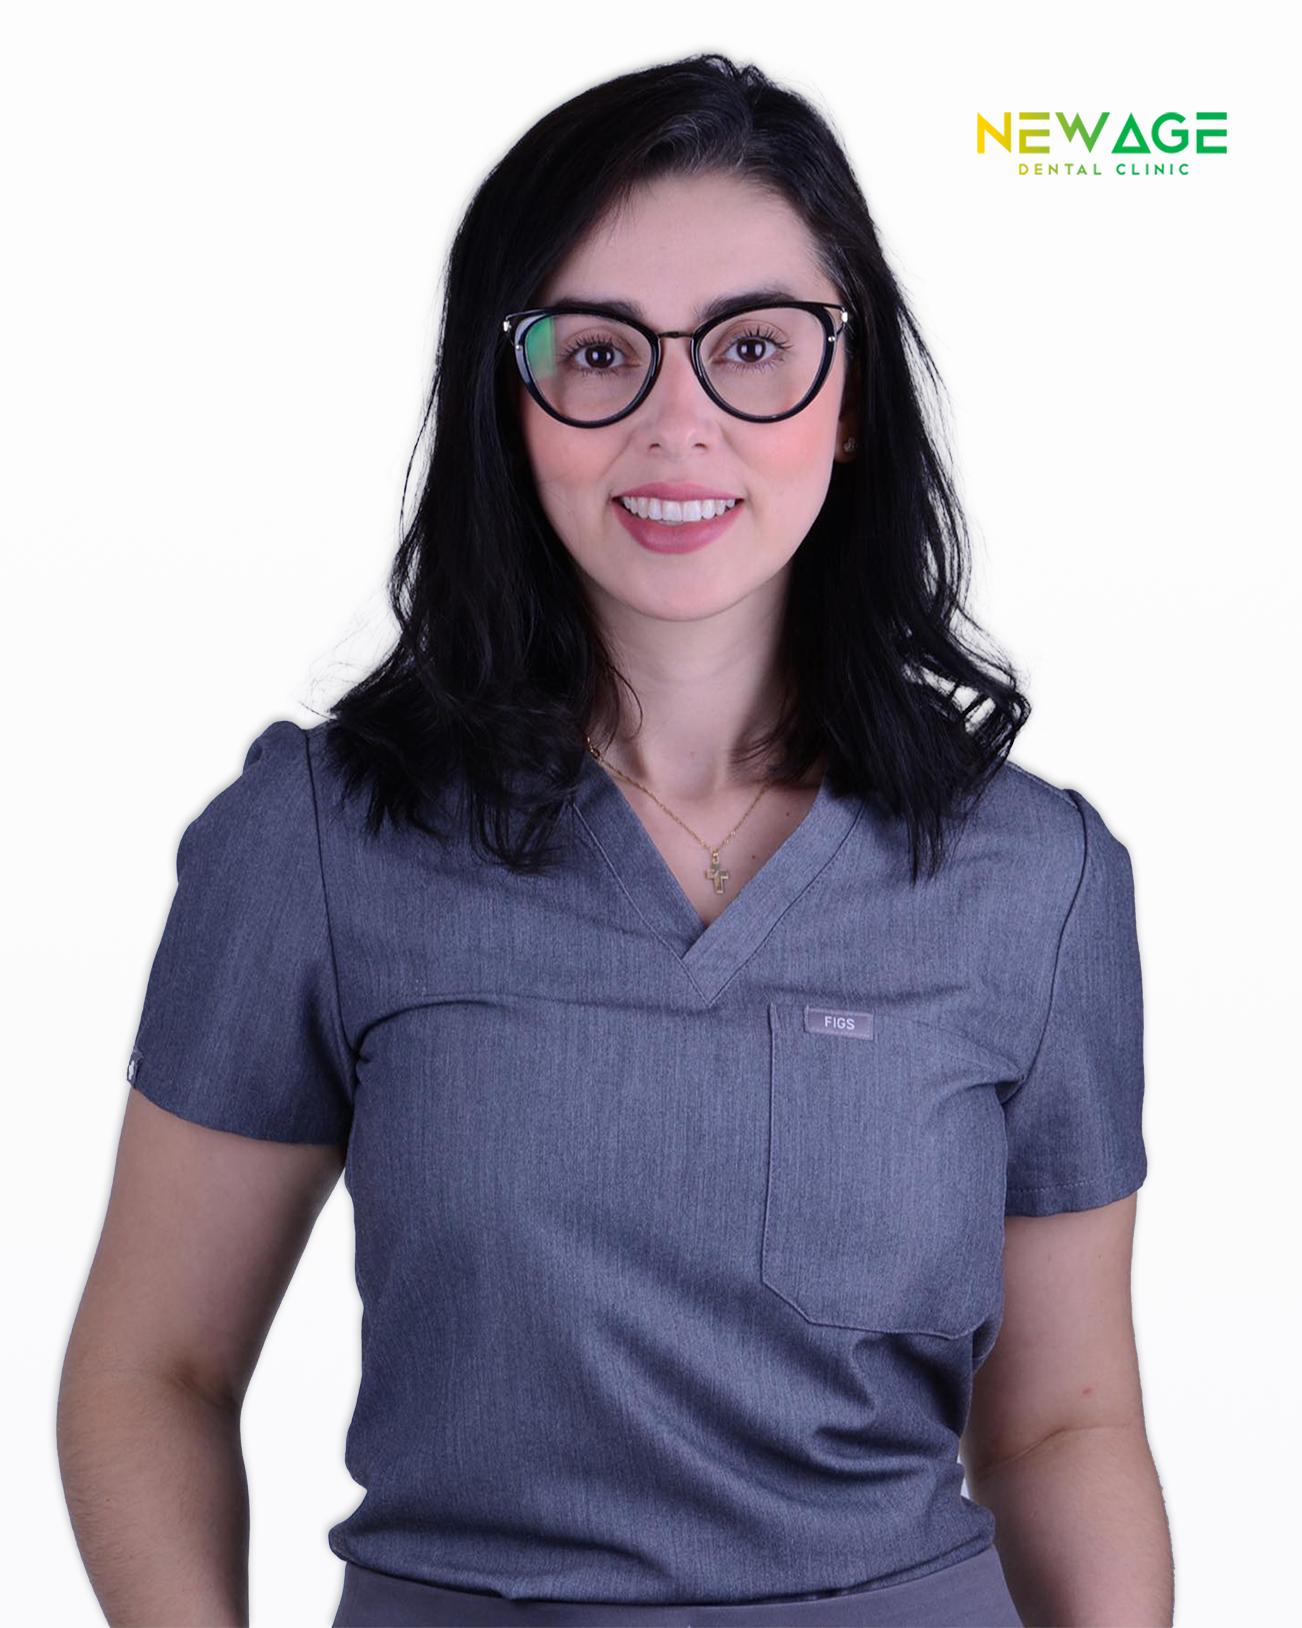 Dr. Silvia Guzman, cosmetic dentist in Tijuana